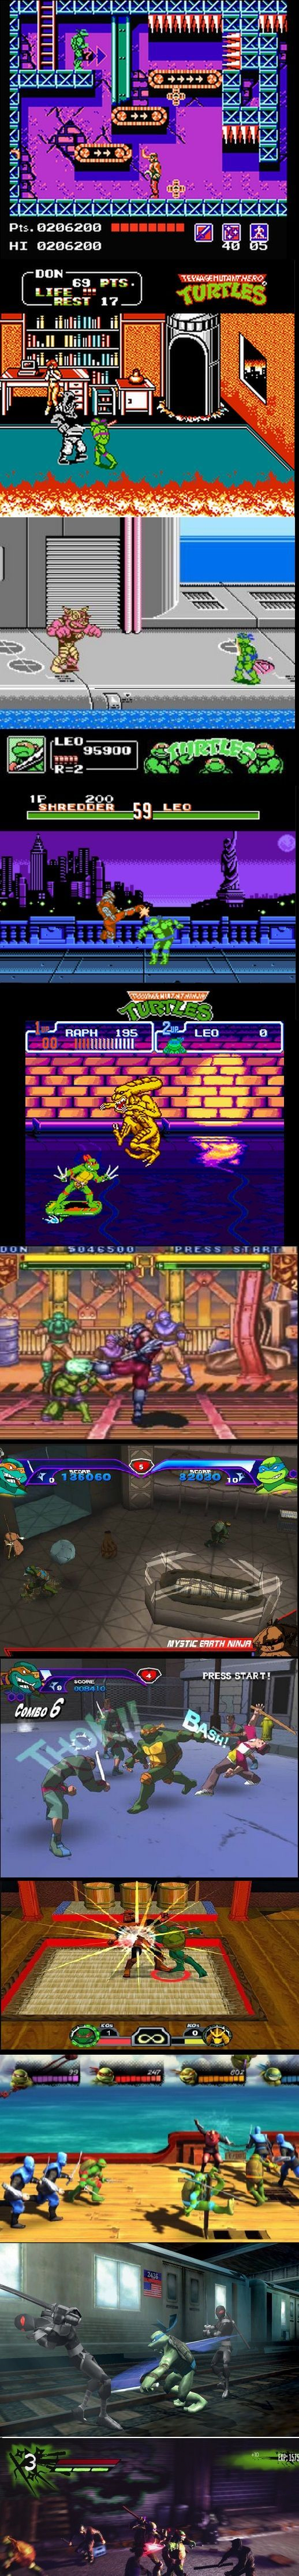 TMNT video games through the years #TMNT #NinjaTurtles #TeenageMutantNinjaTurtles